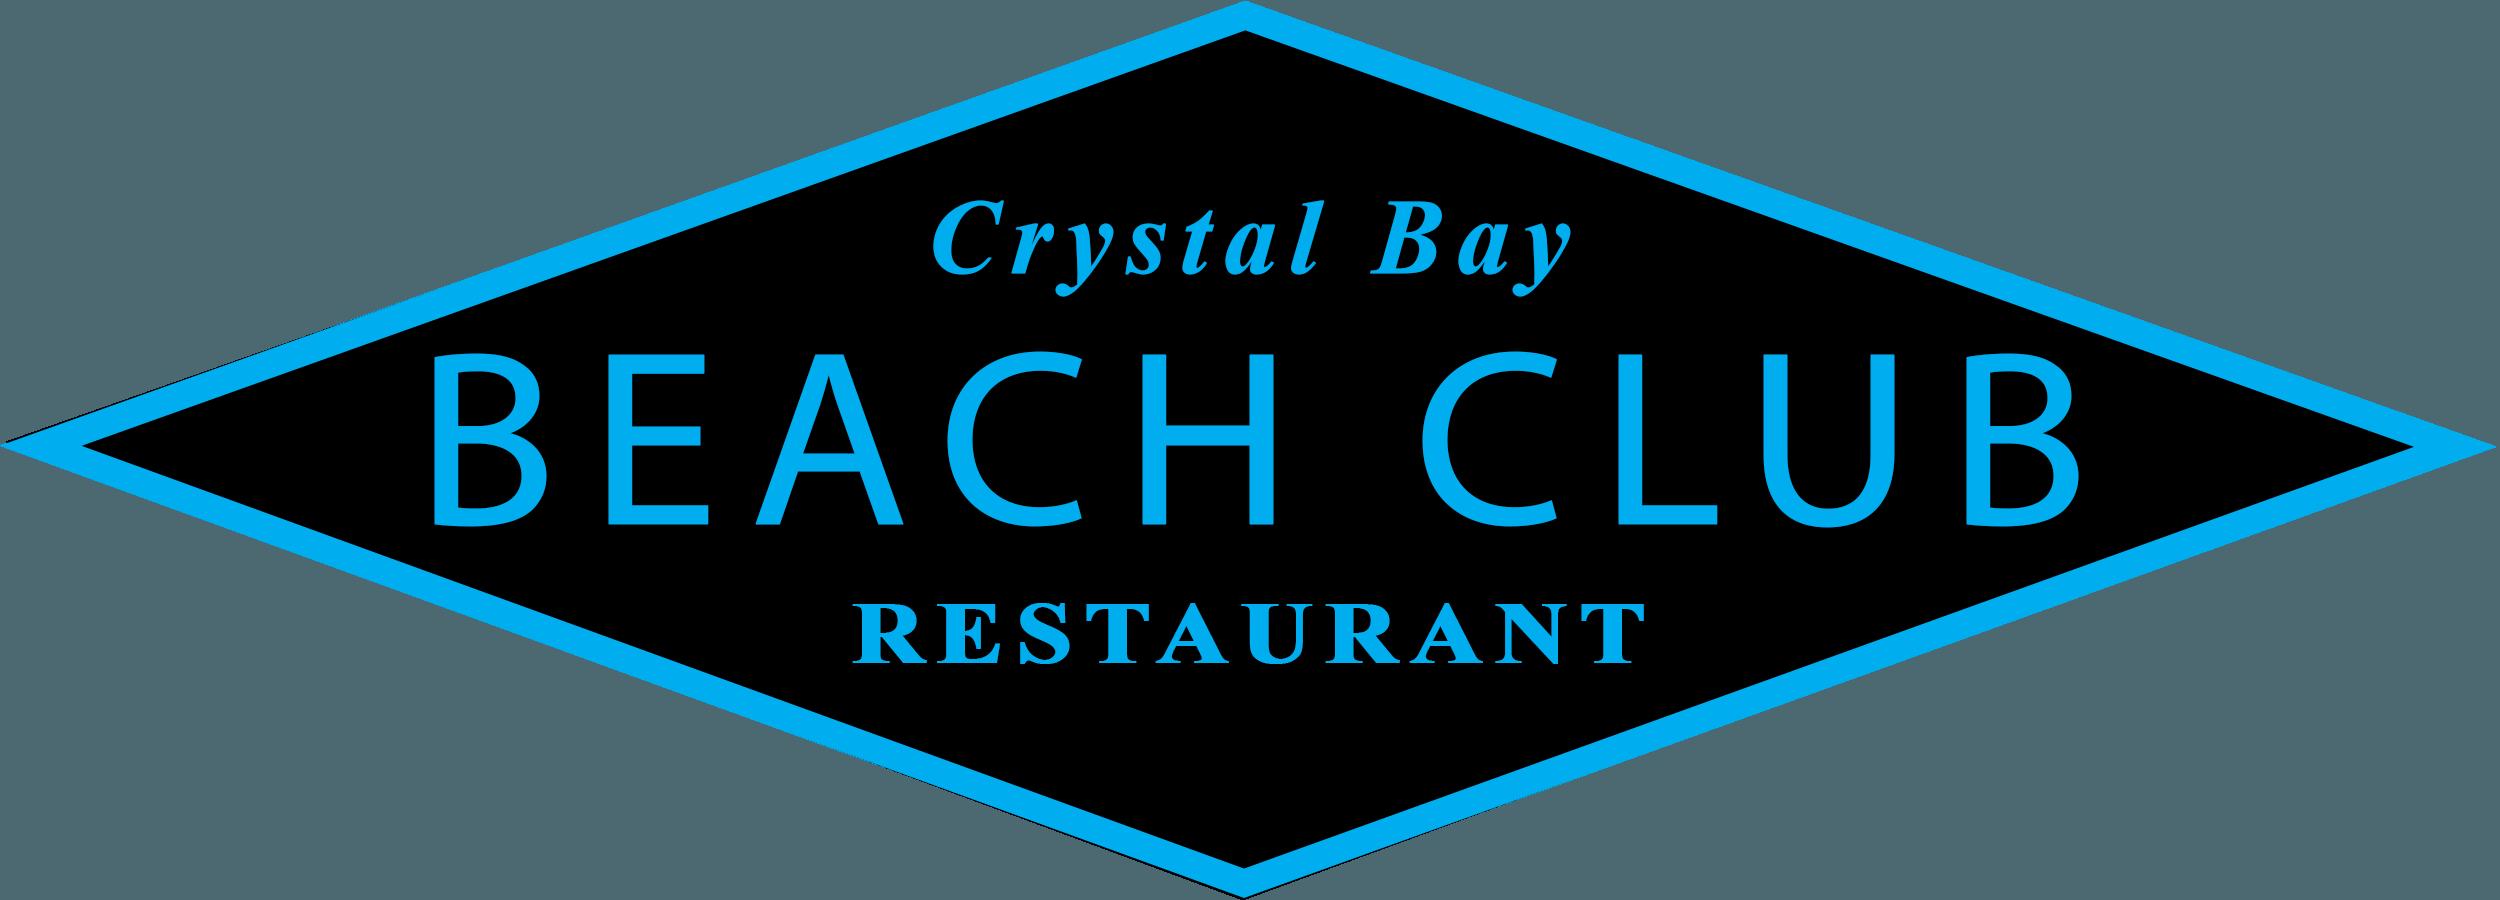 Crystal Bay Beach Club Koh Samui Thailand